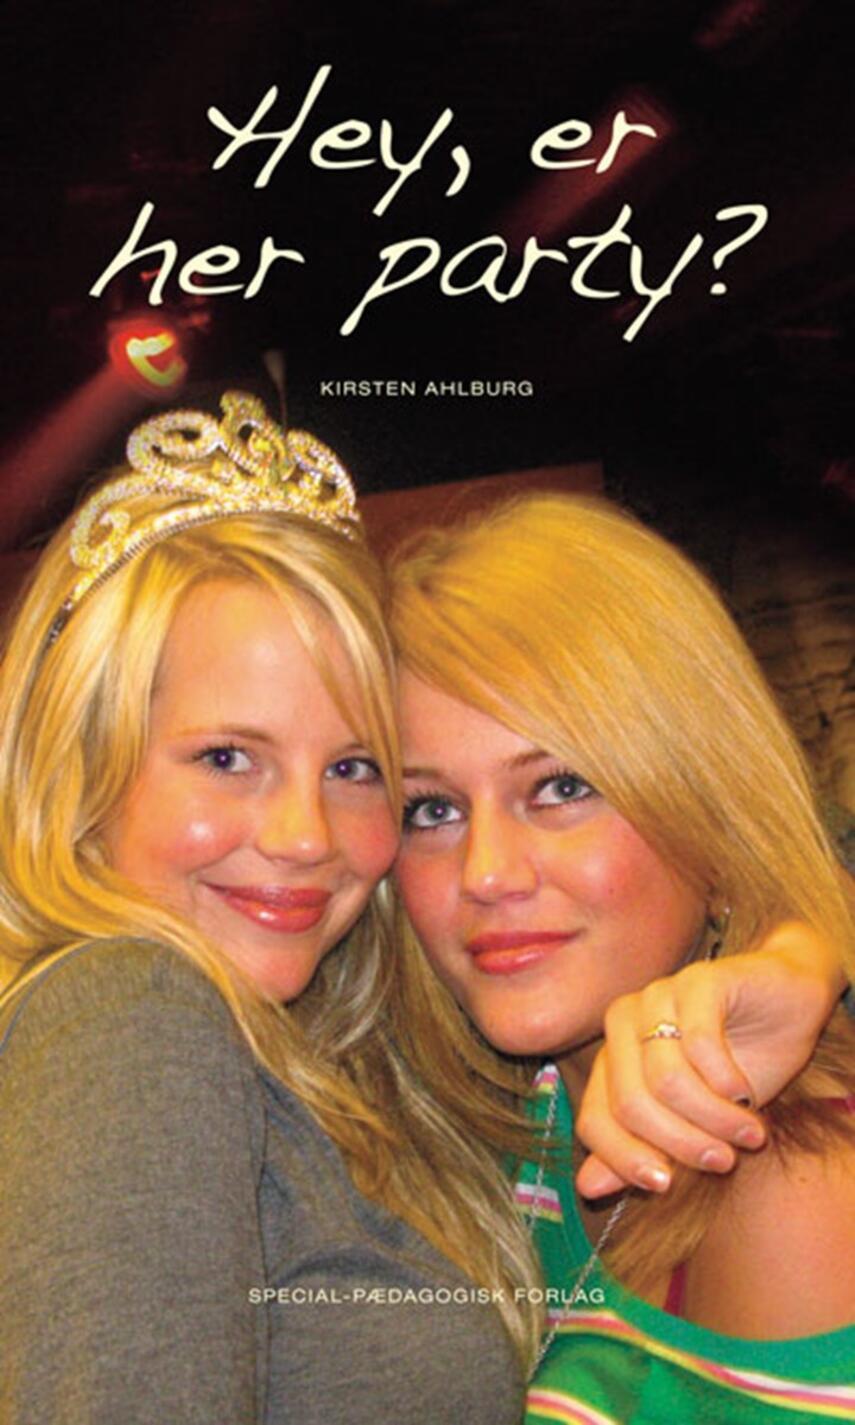 Kirsten Ahlburg: Hey, er her party?